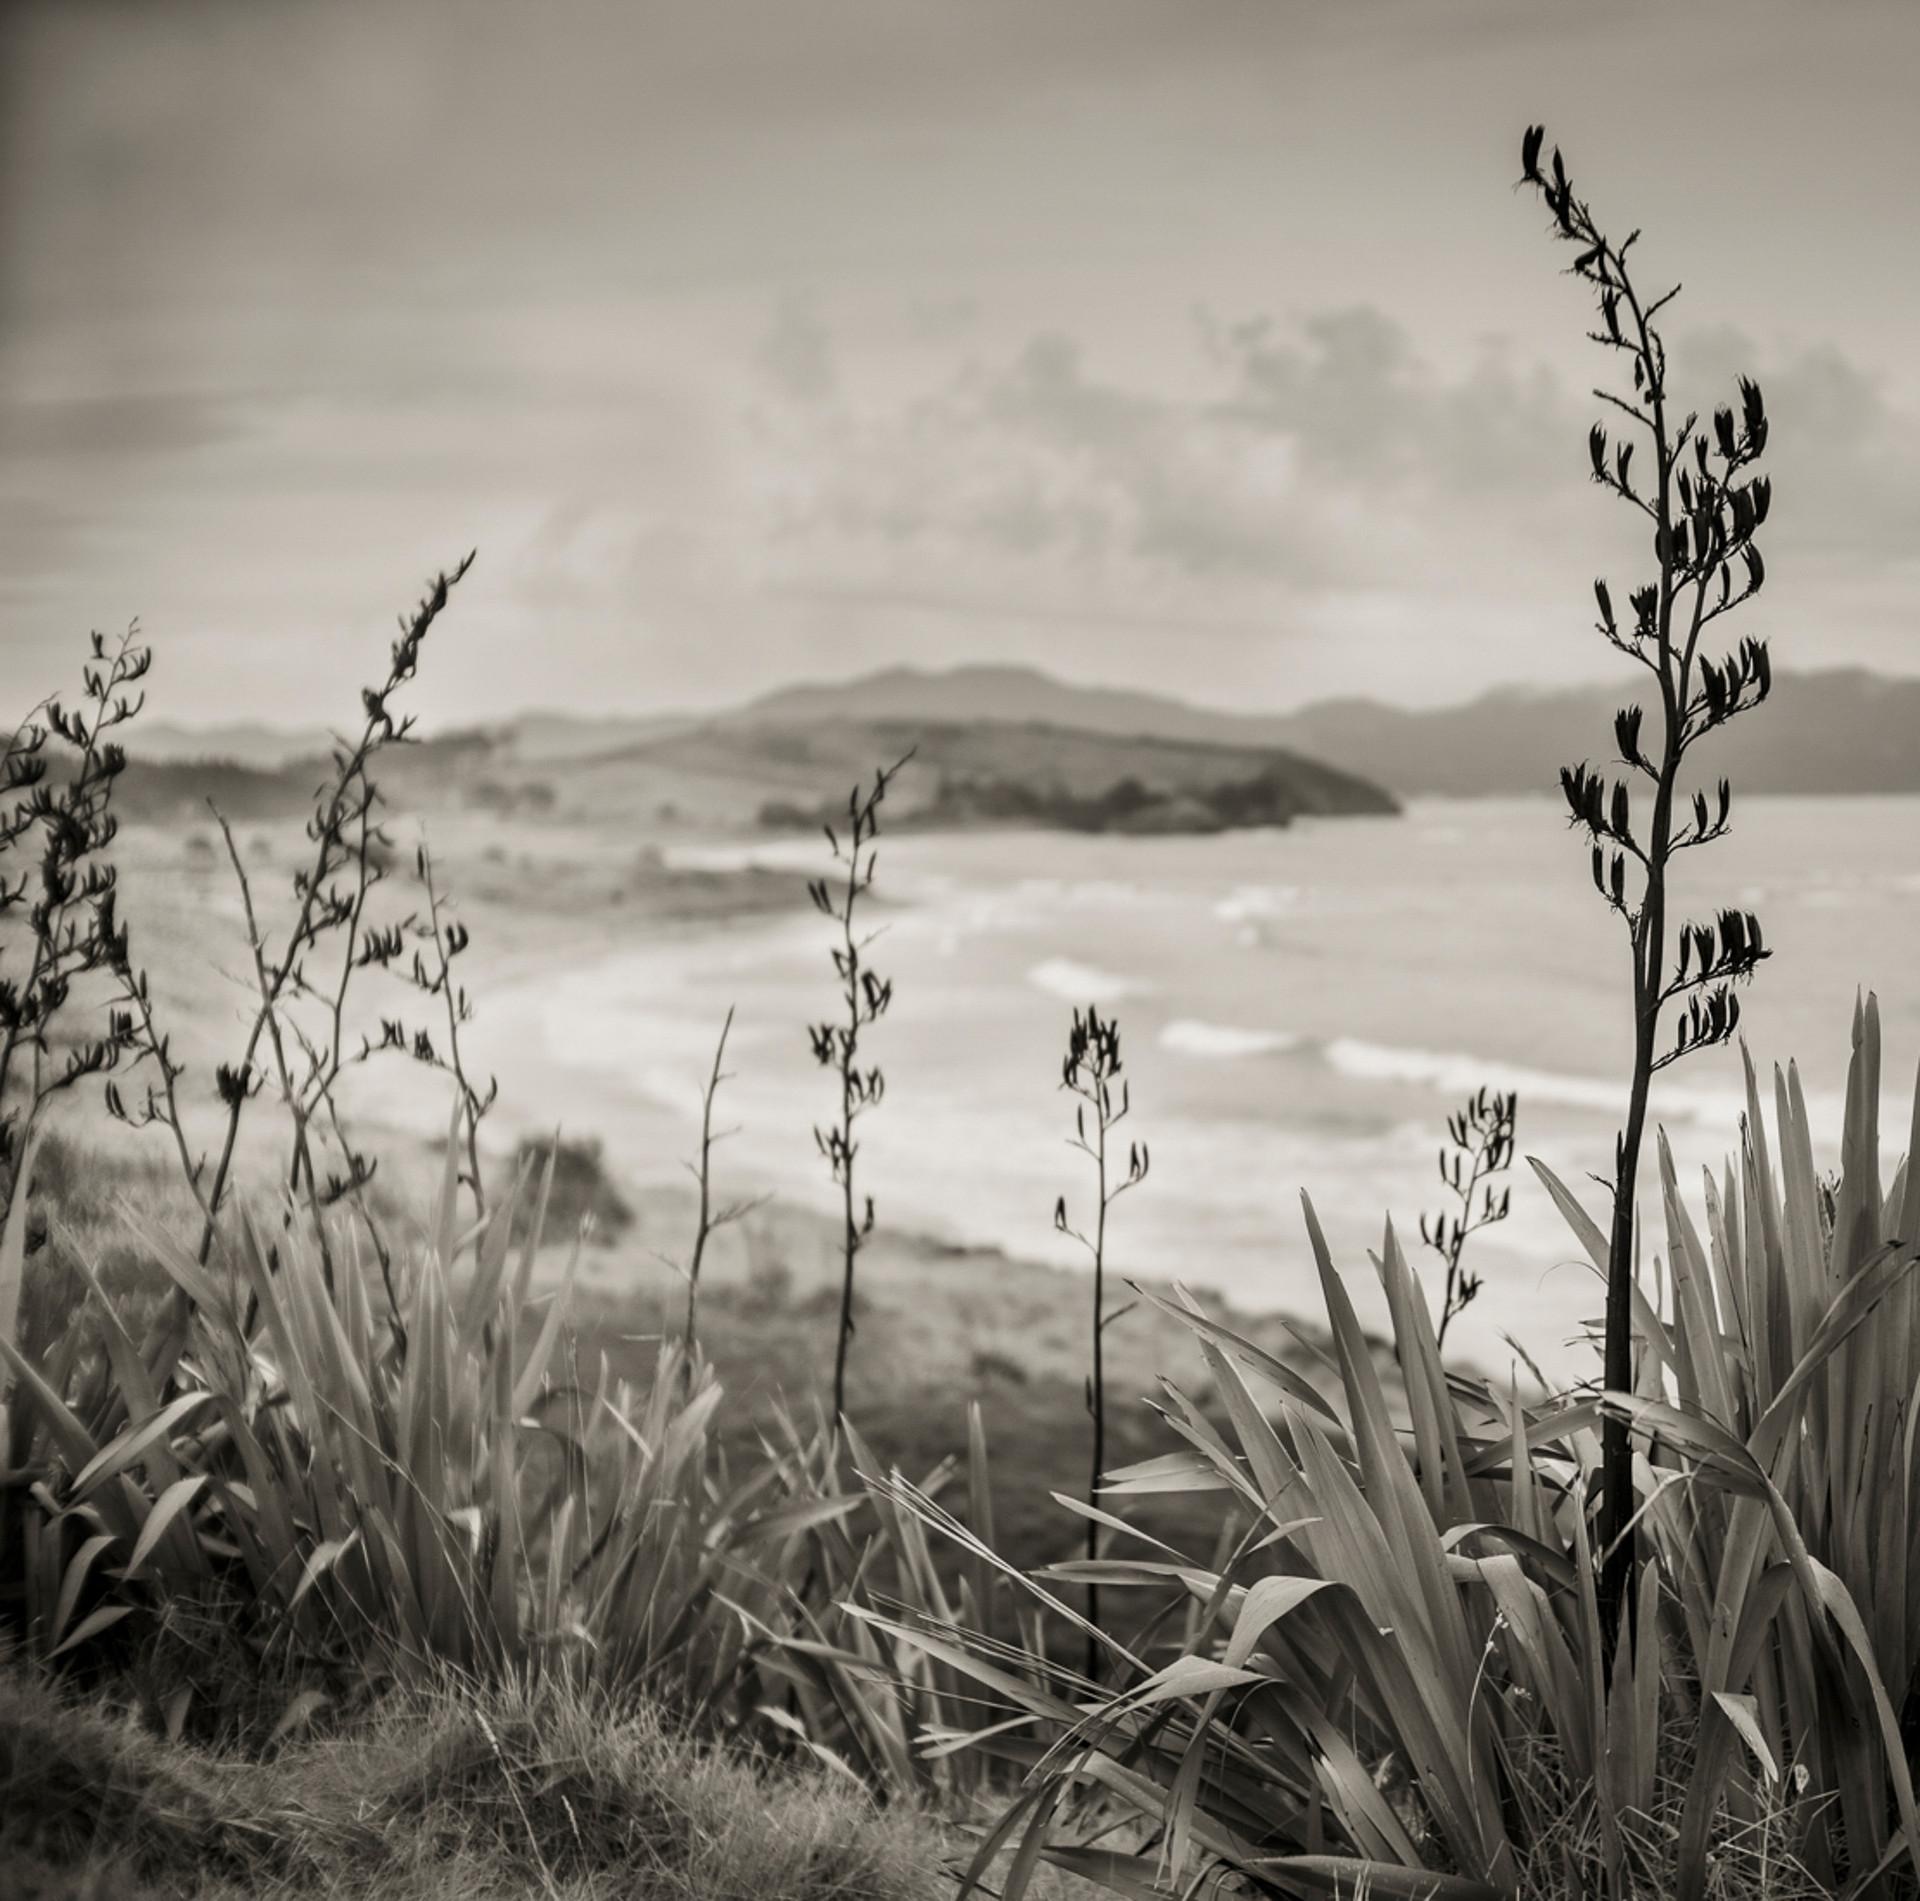 Siddho-Photography-LS-BW-13.jpg